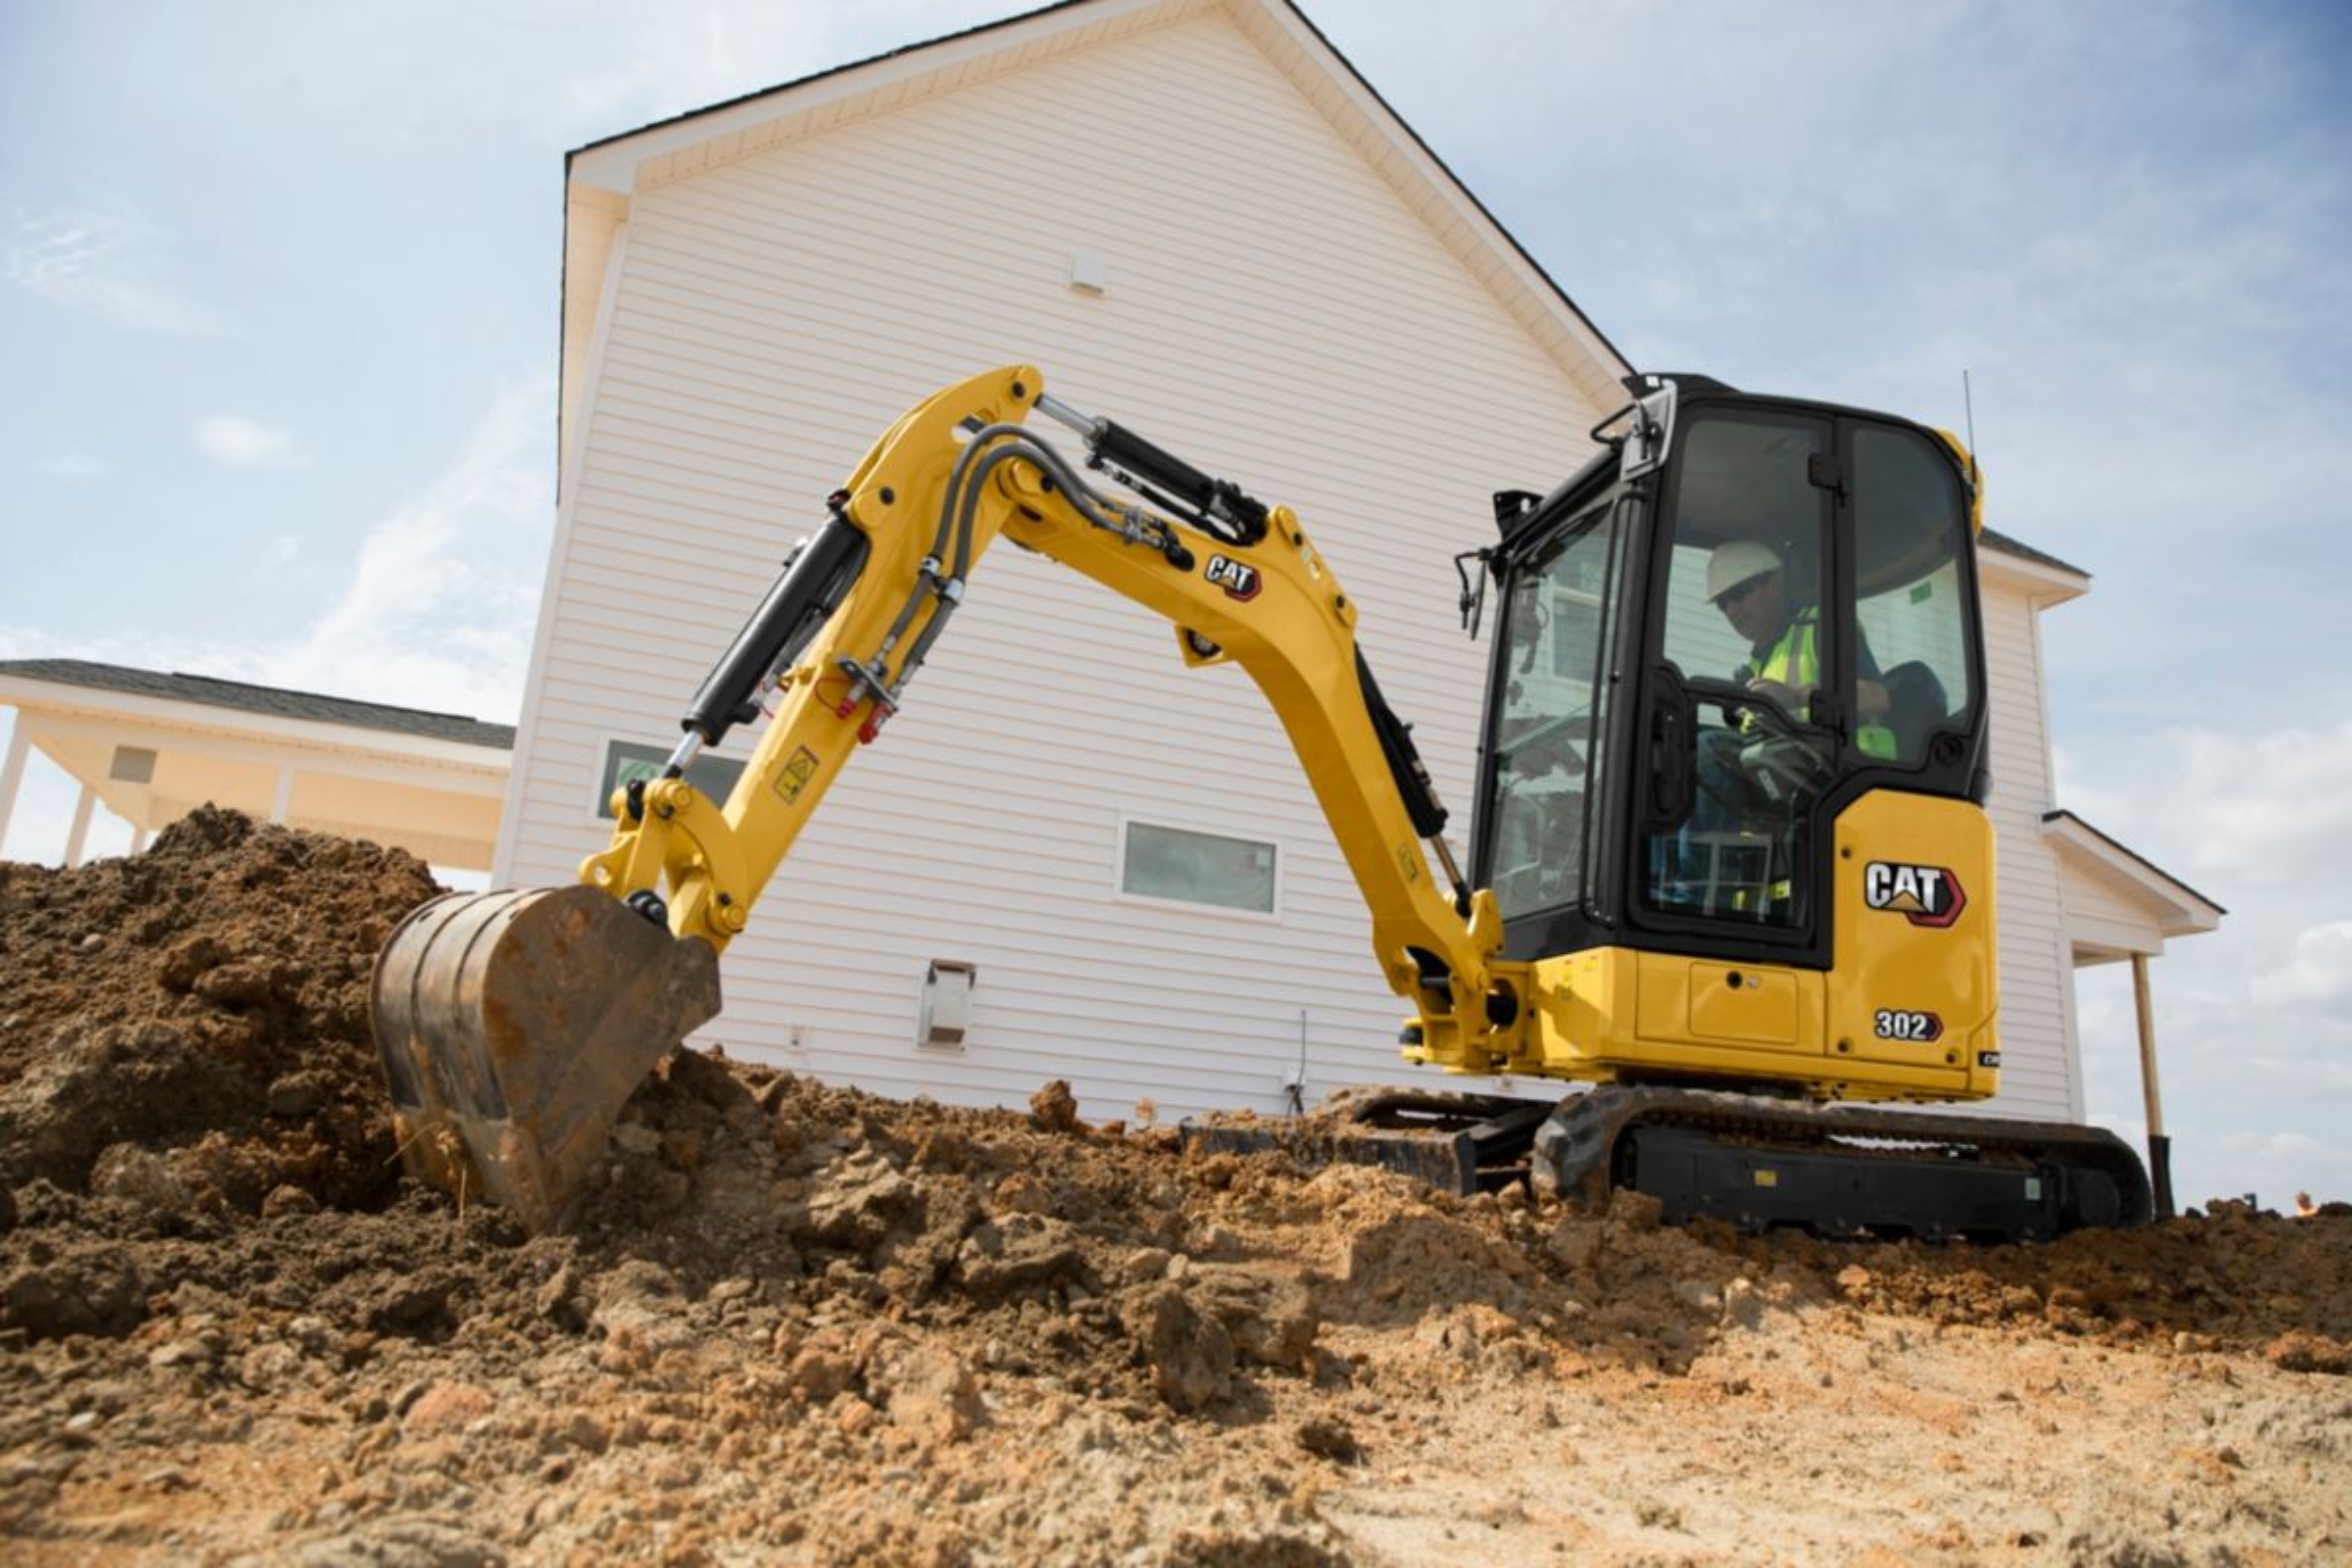 302 CR Mini Hydraulic Excavator>